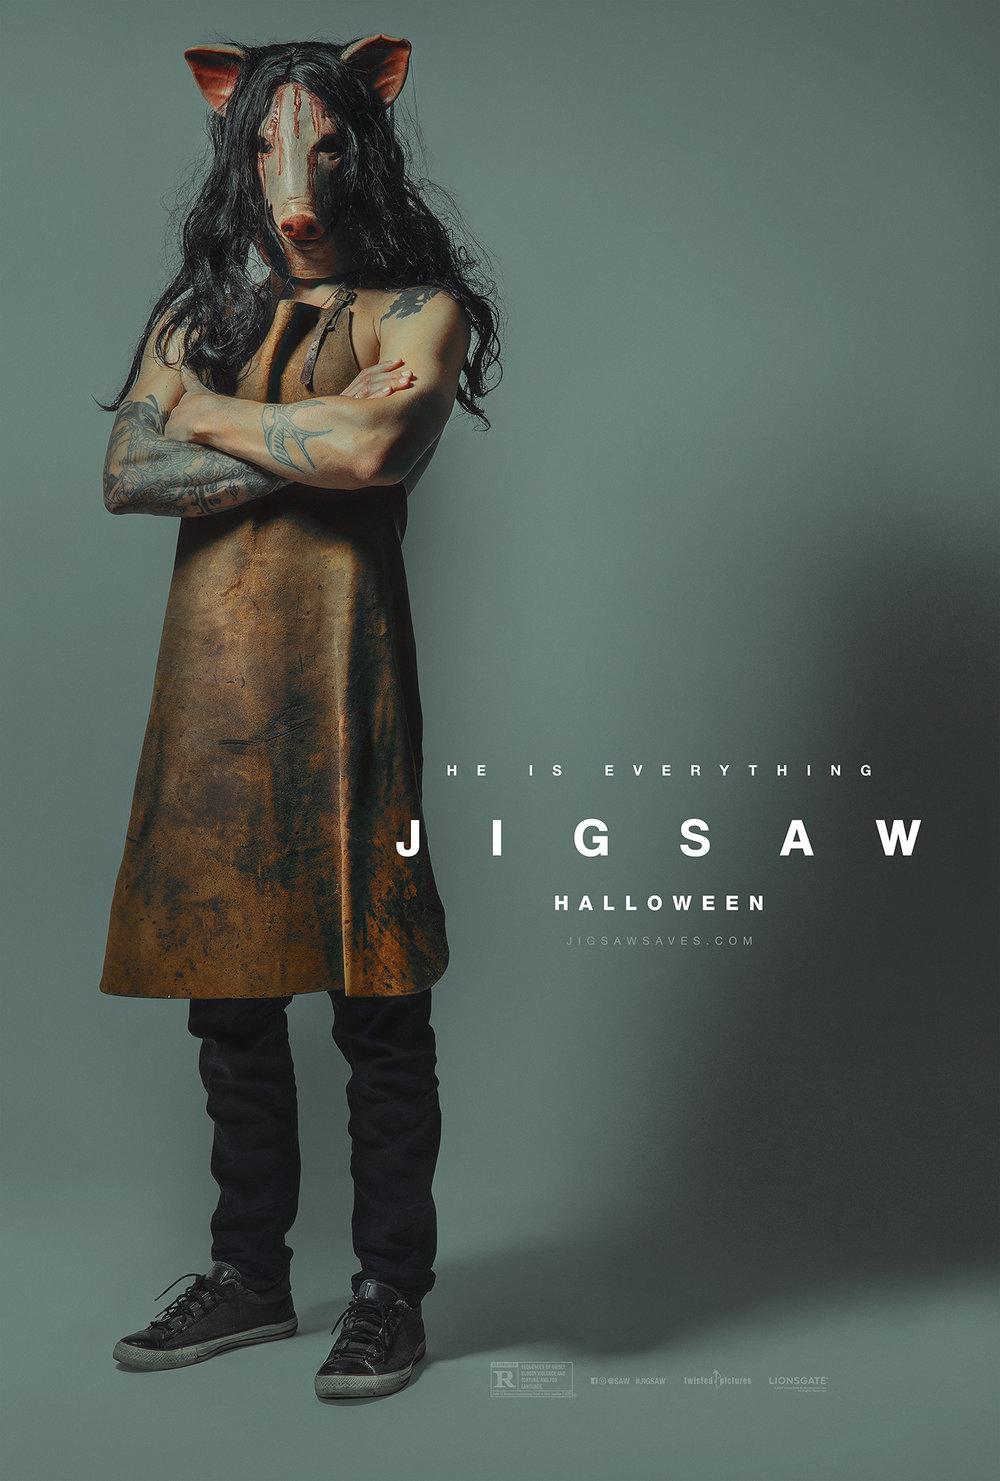 Jigsaw_1Sht_Online_Butcher_100dpi.jpg